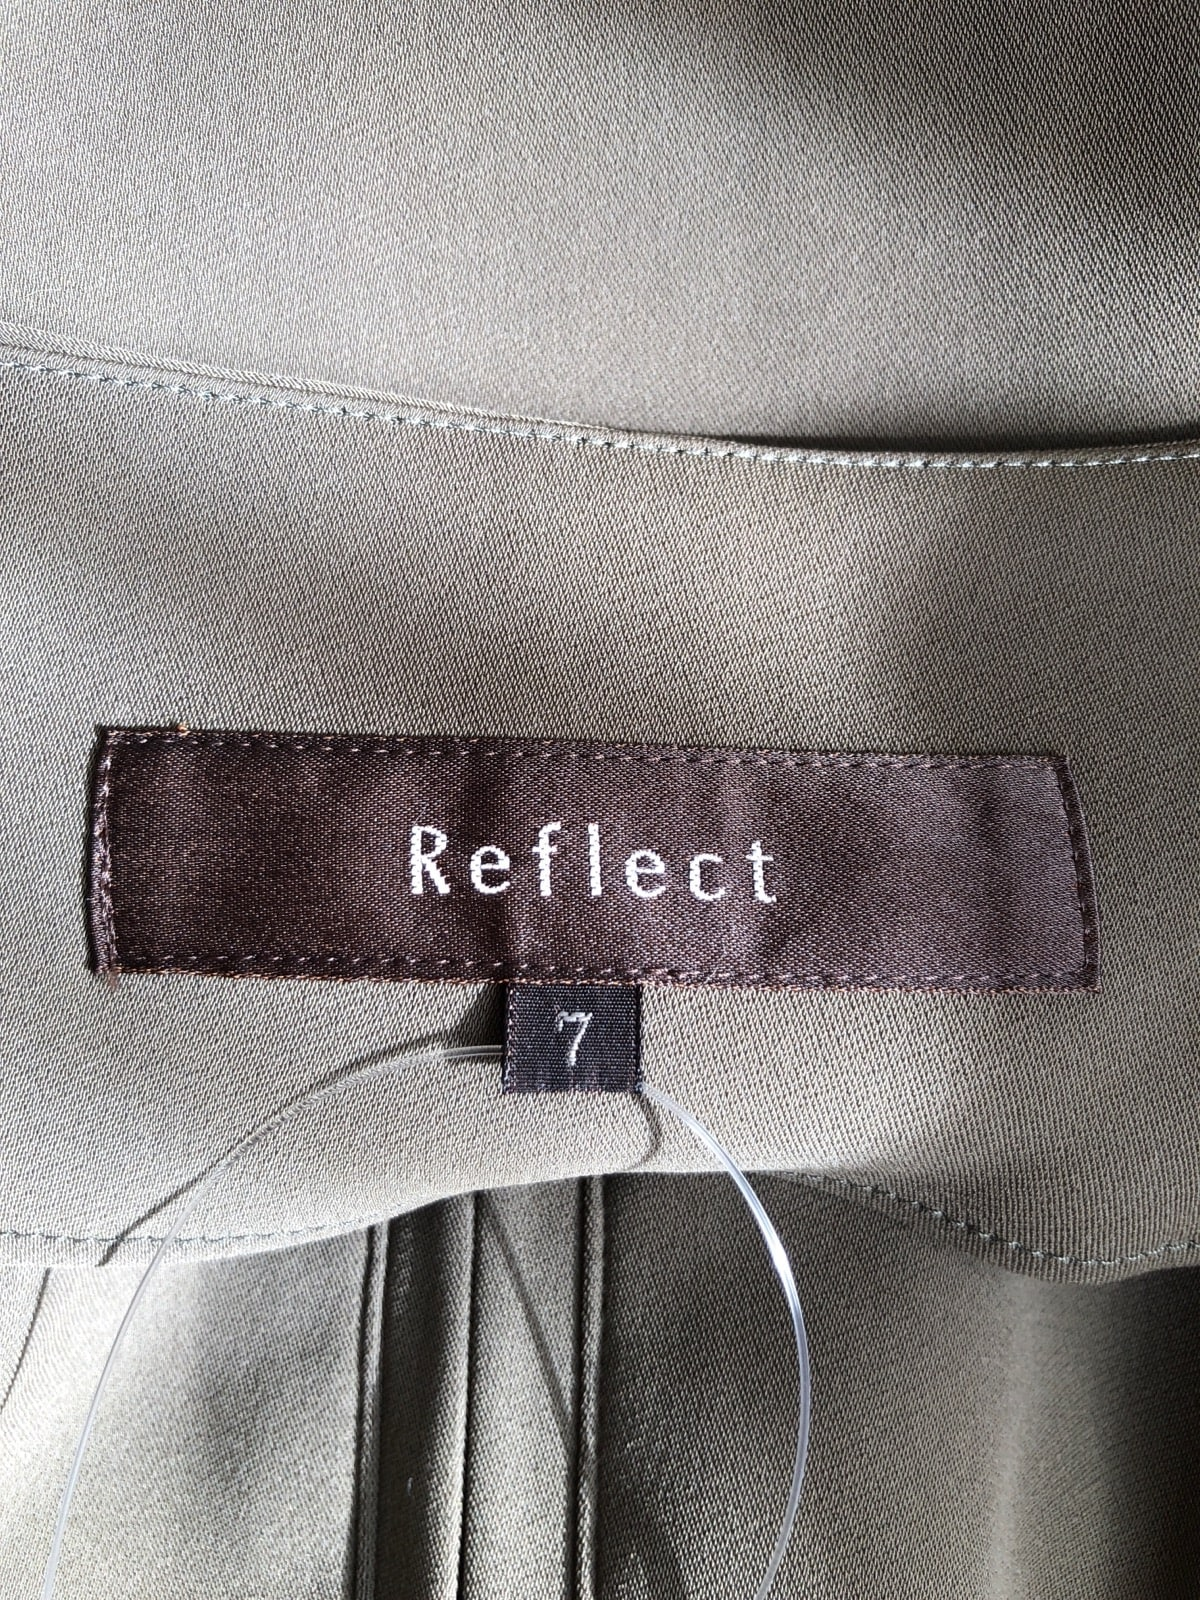 ReFLEcT(リフレクト)のブルゾン